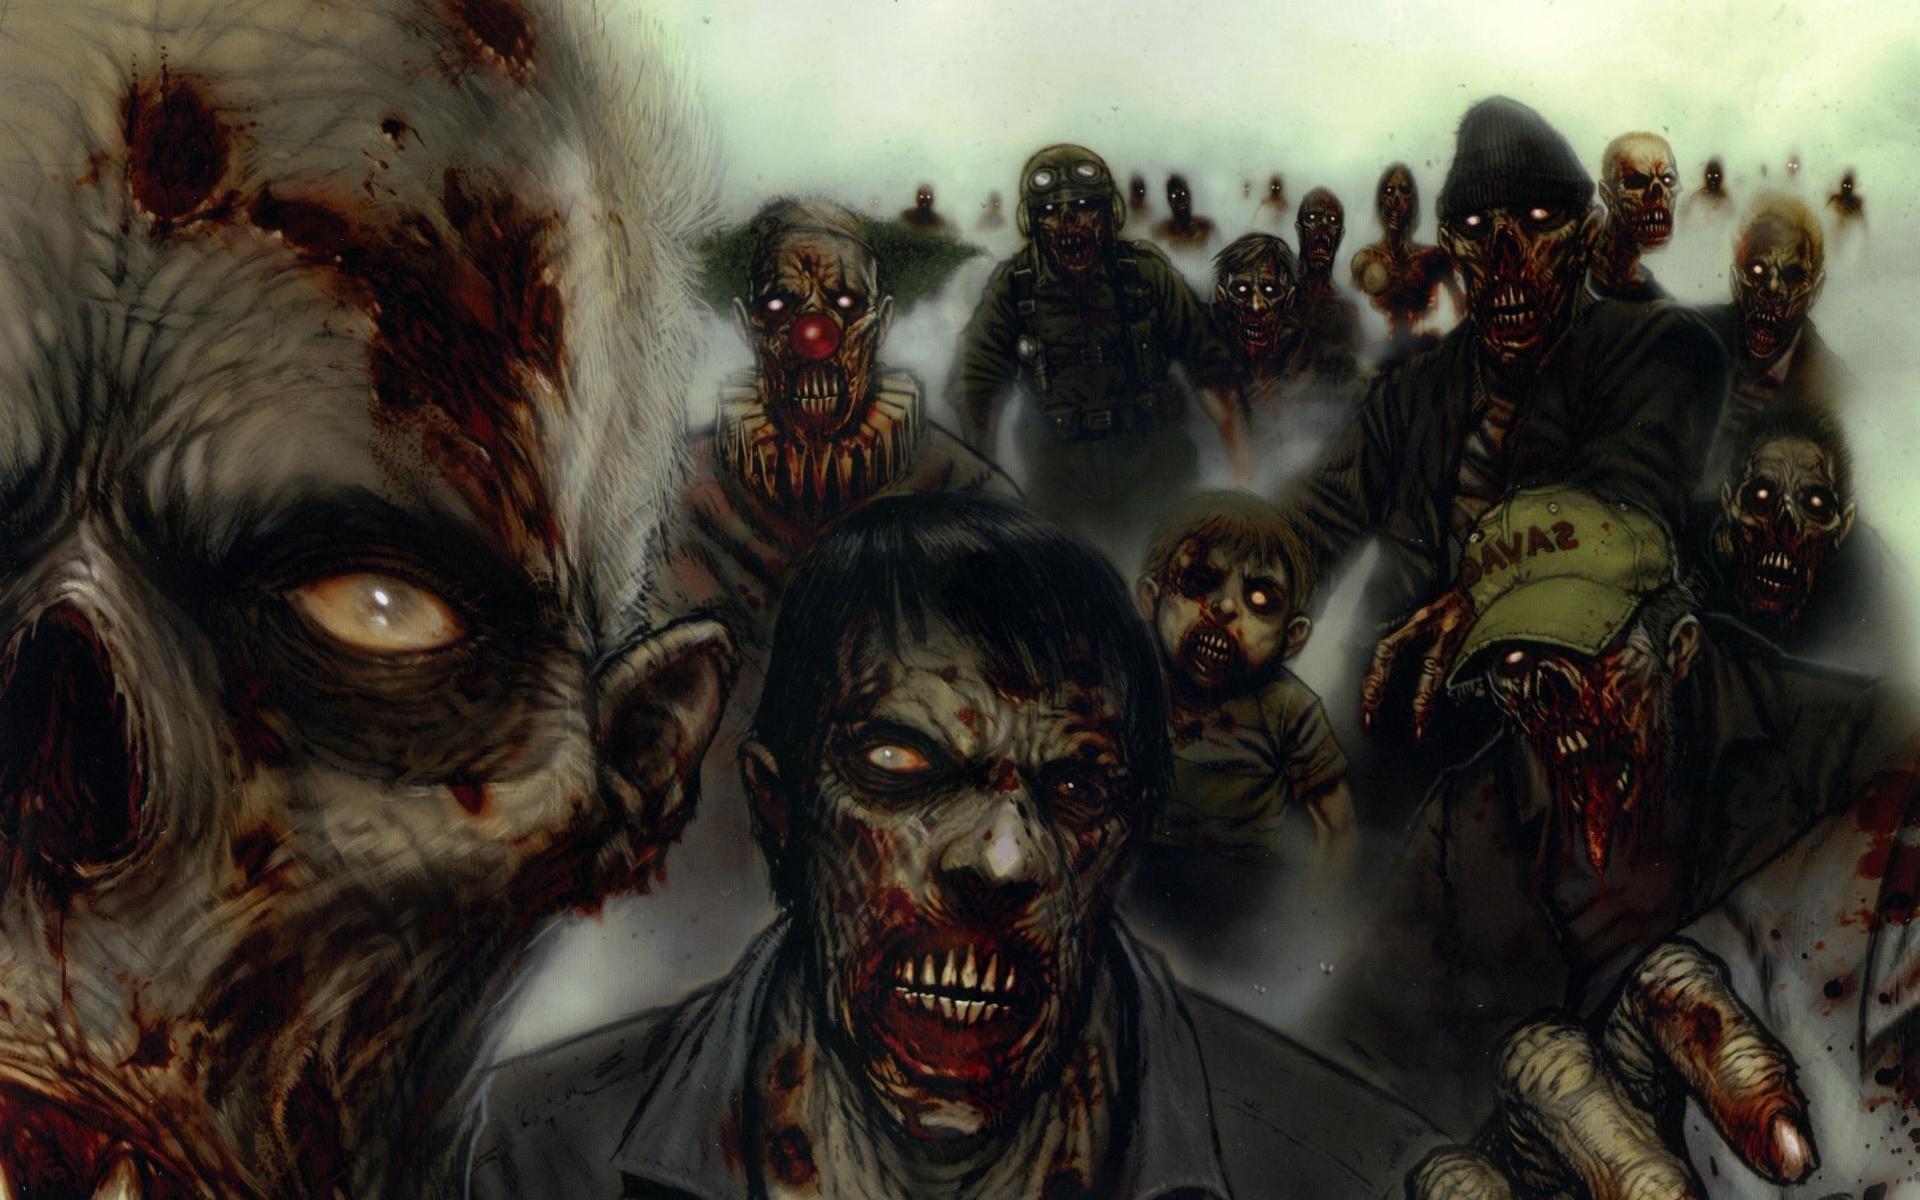 [73+] Zombie Wallpaper Widescreen on WallpaperSafari